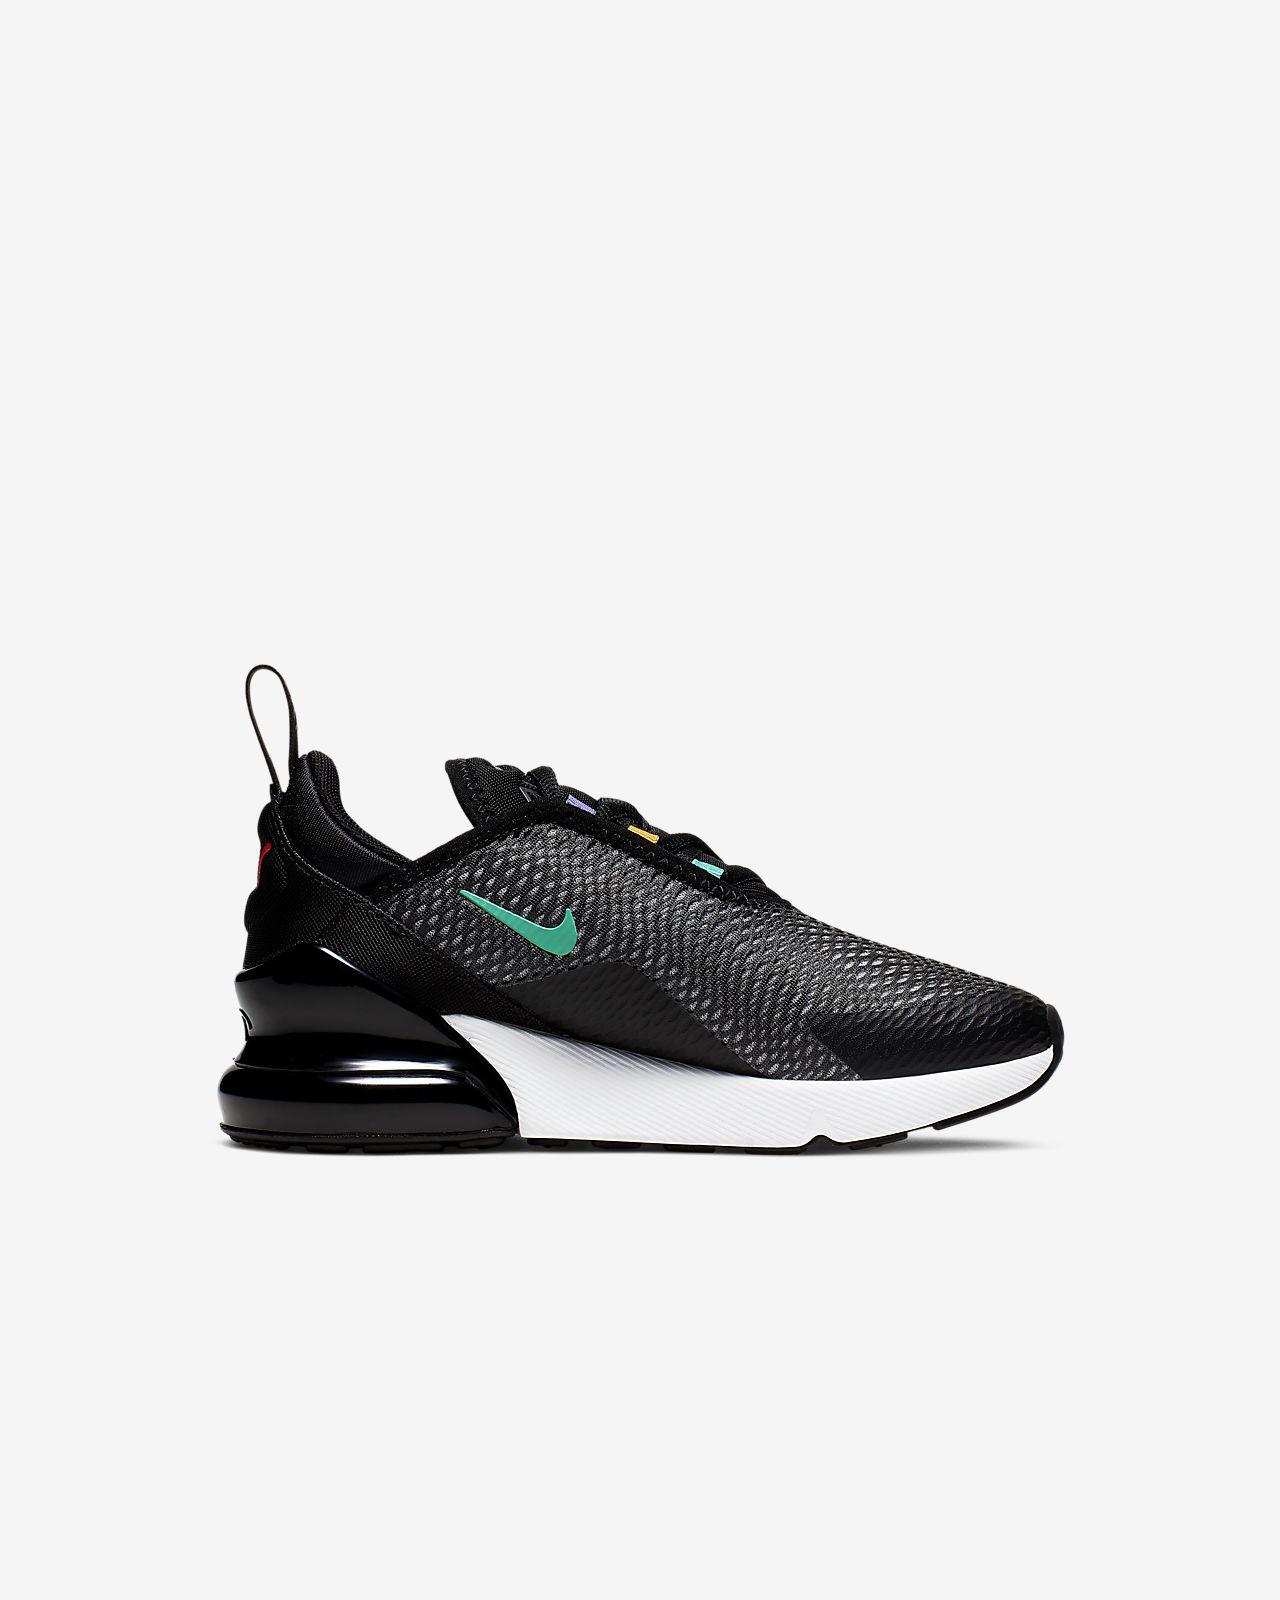 Nike Air Max 720 Game Change Sneaker Femmes Enfants Garçons